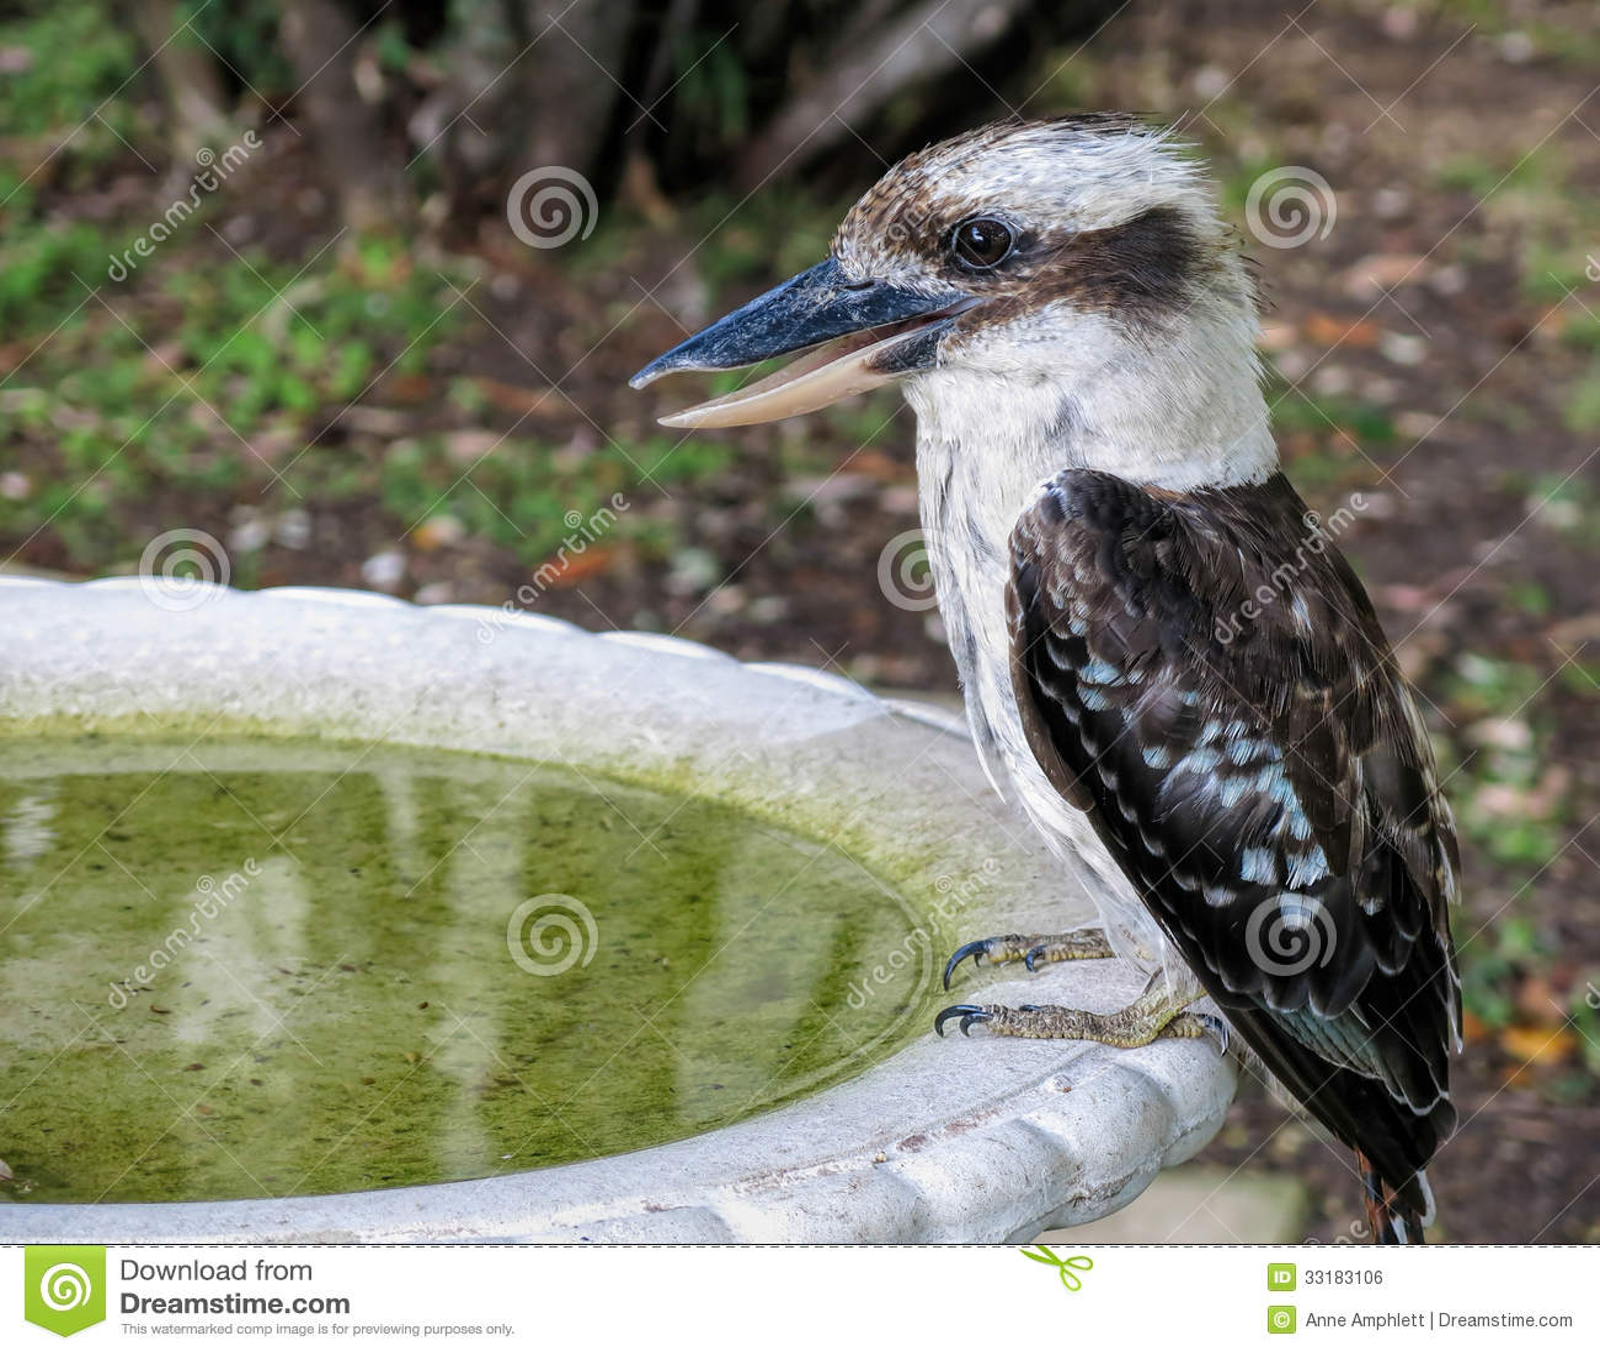 Thirsty Kookaburra